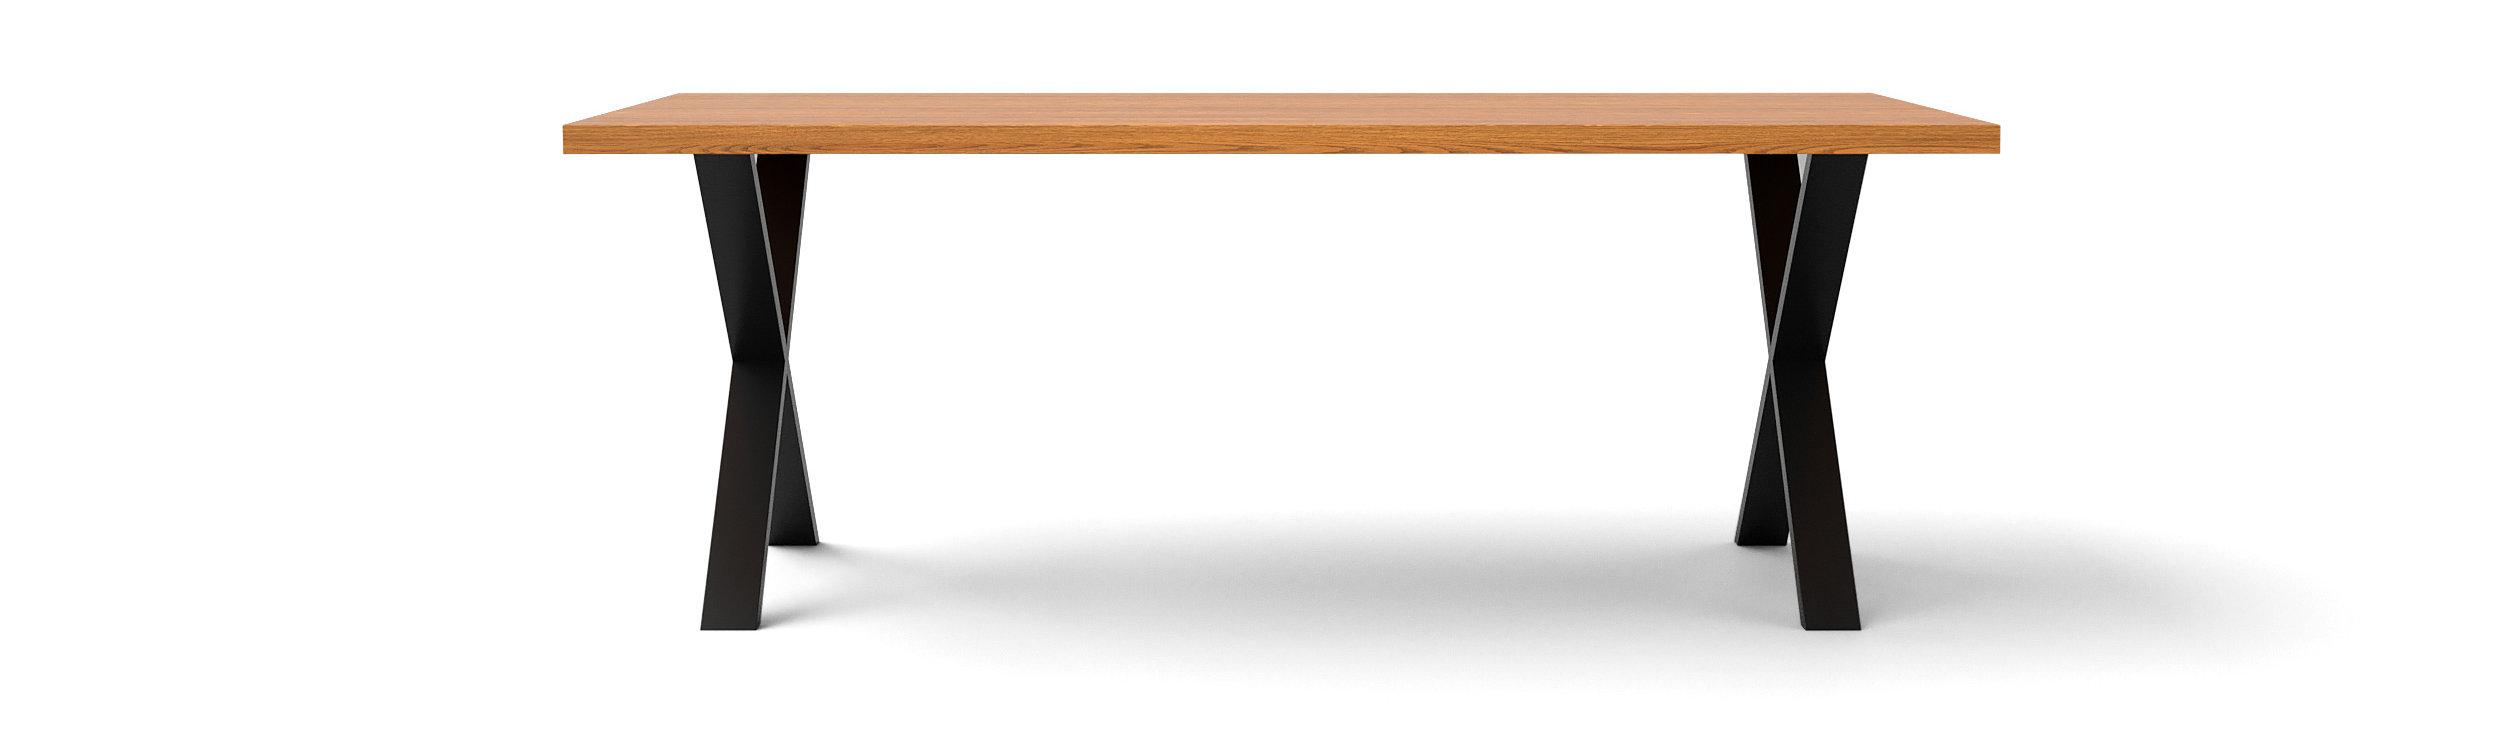 Stół Fogo - Adwood